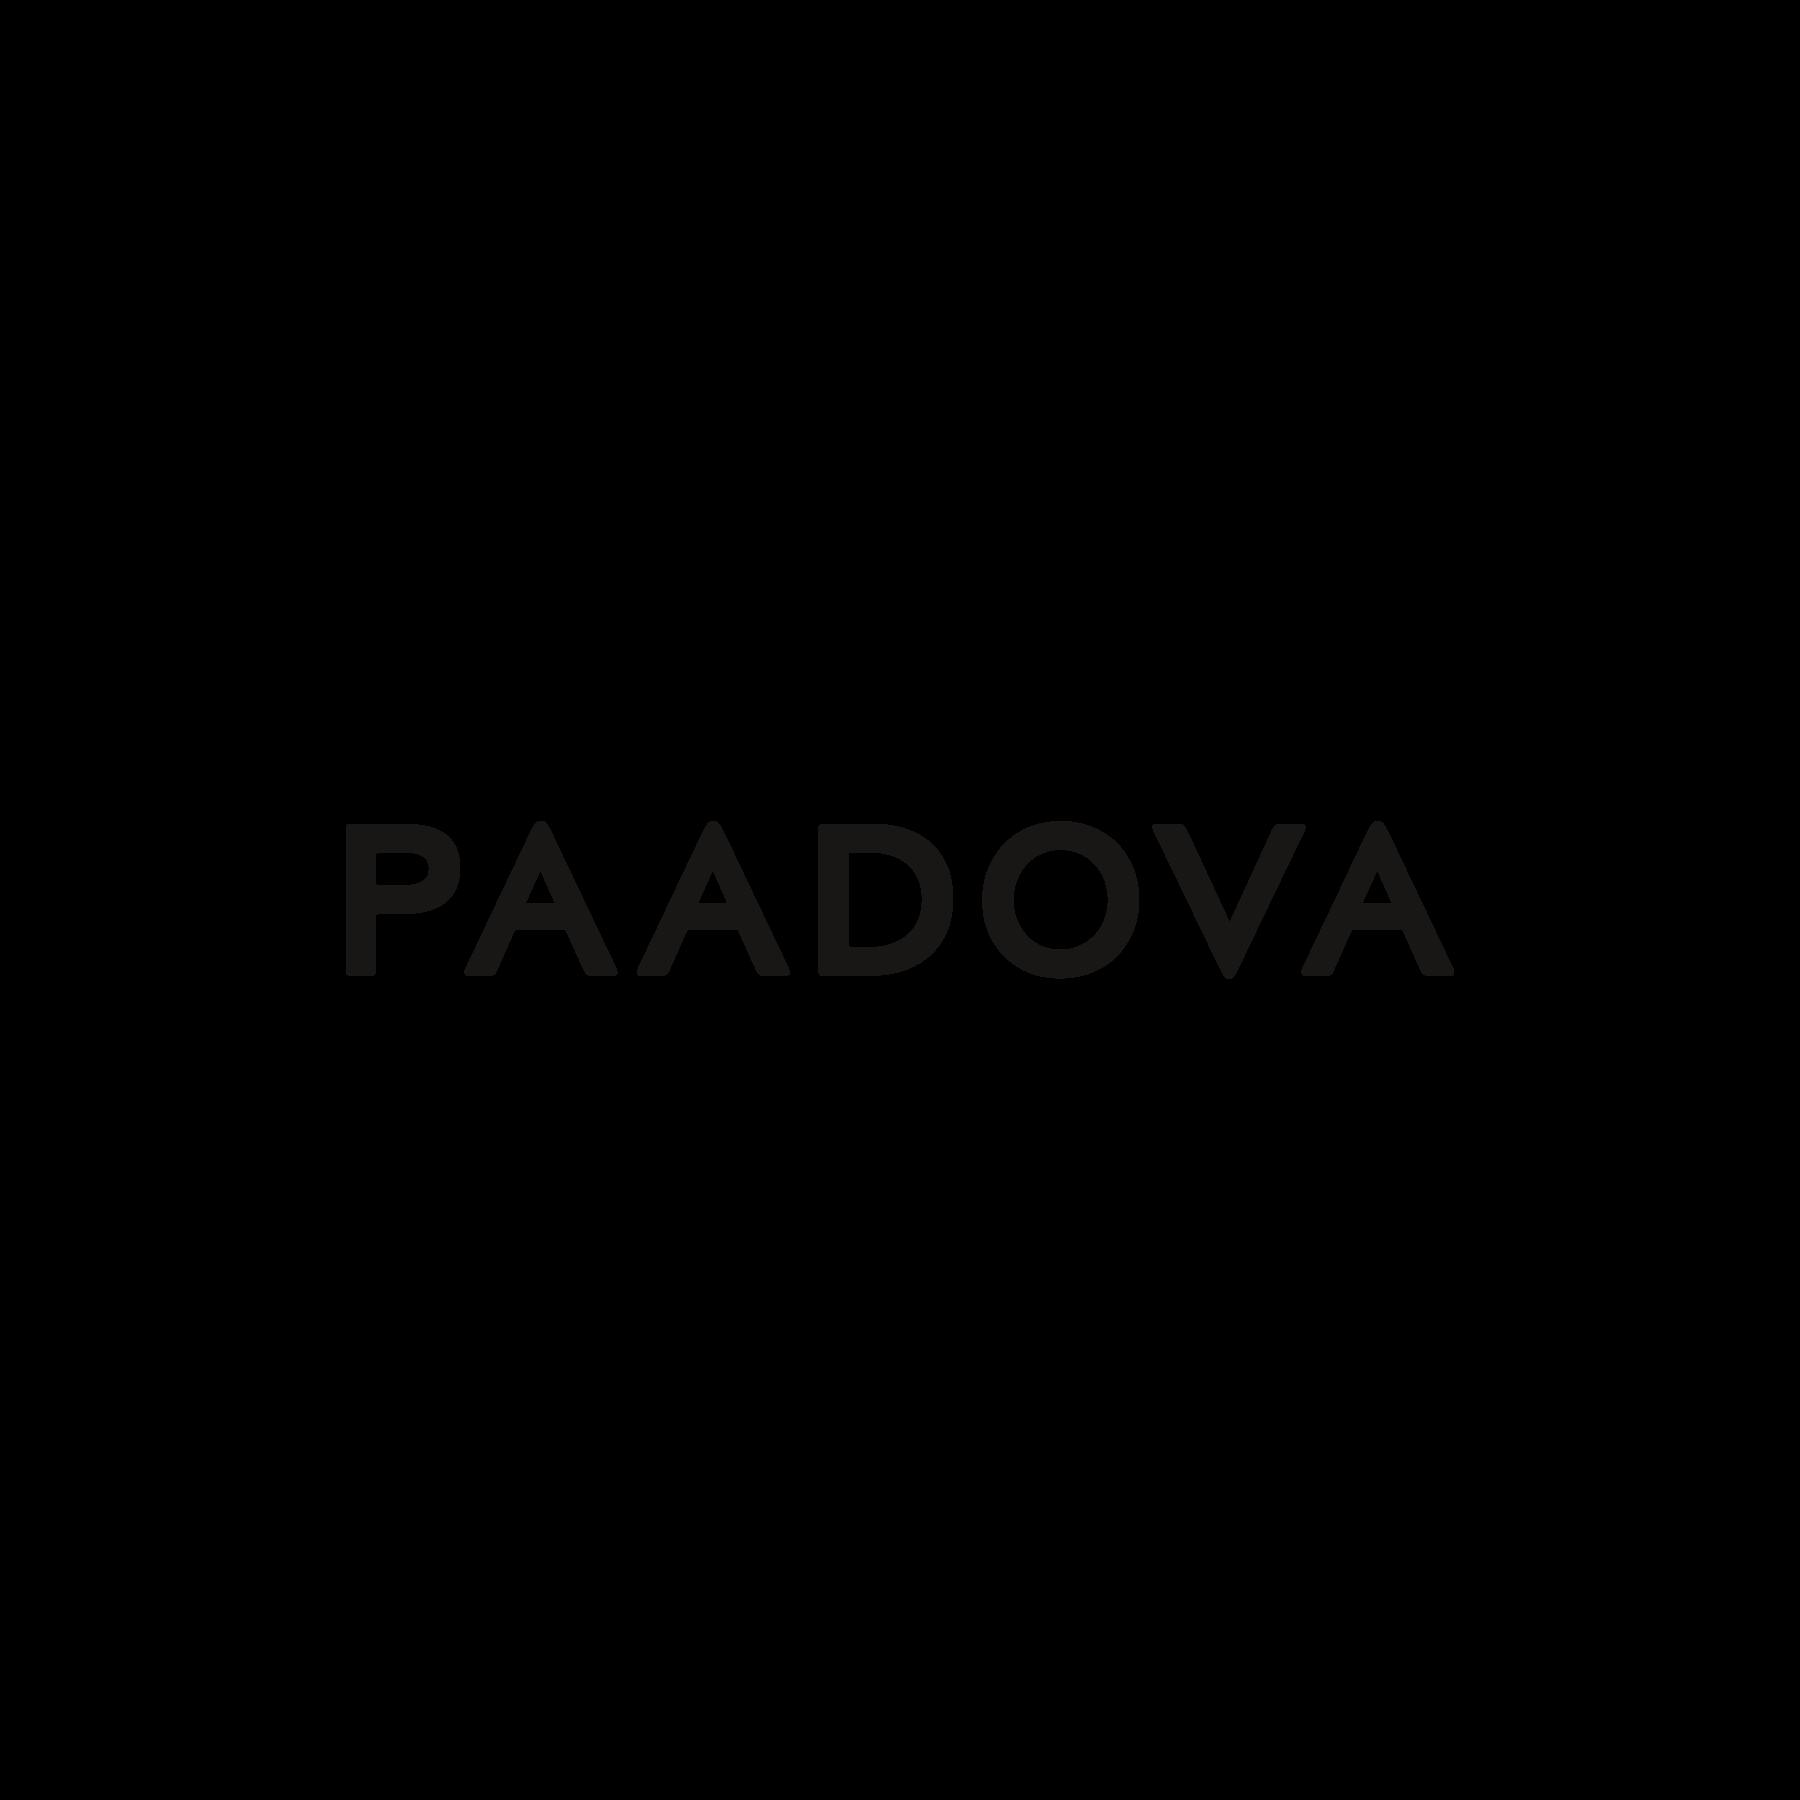 Paadova_1800x1800px